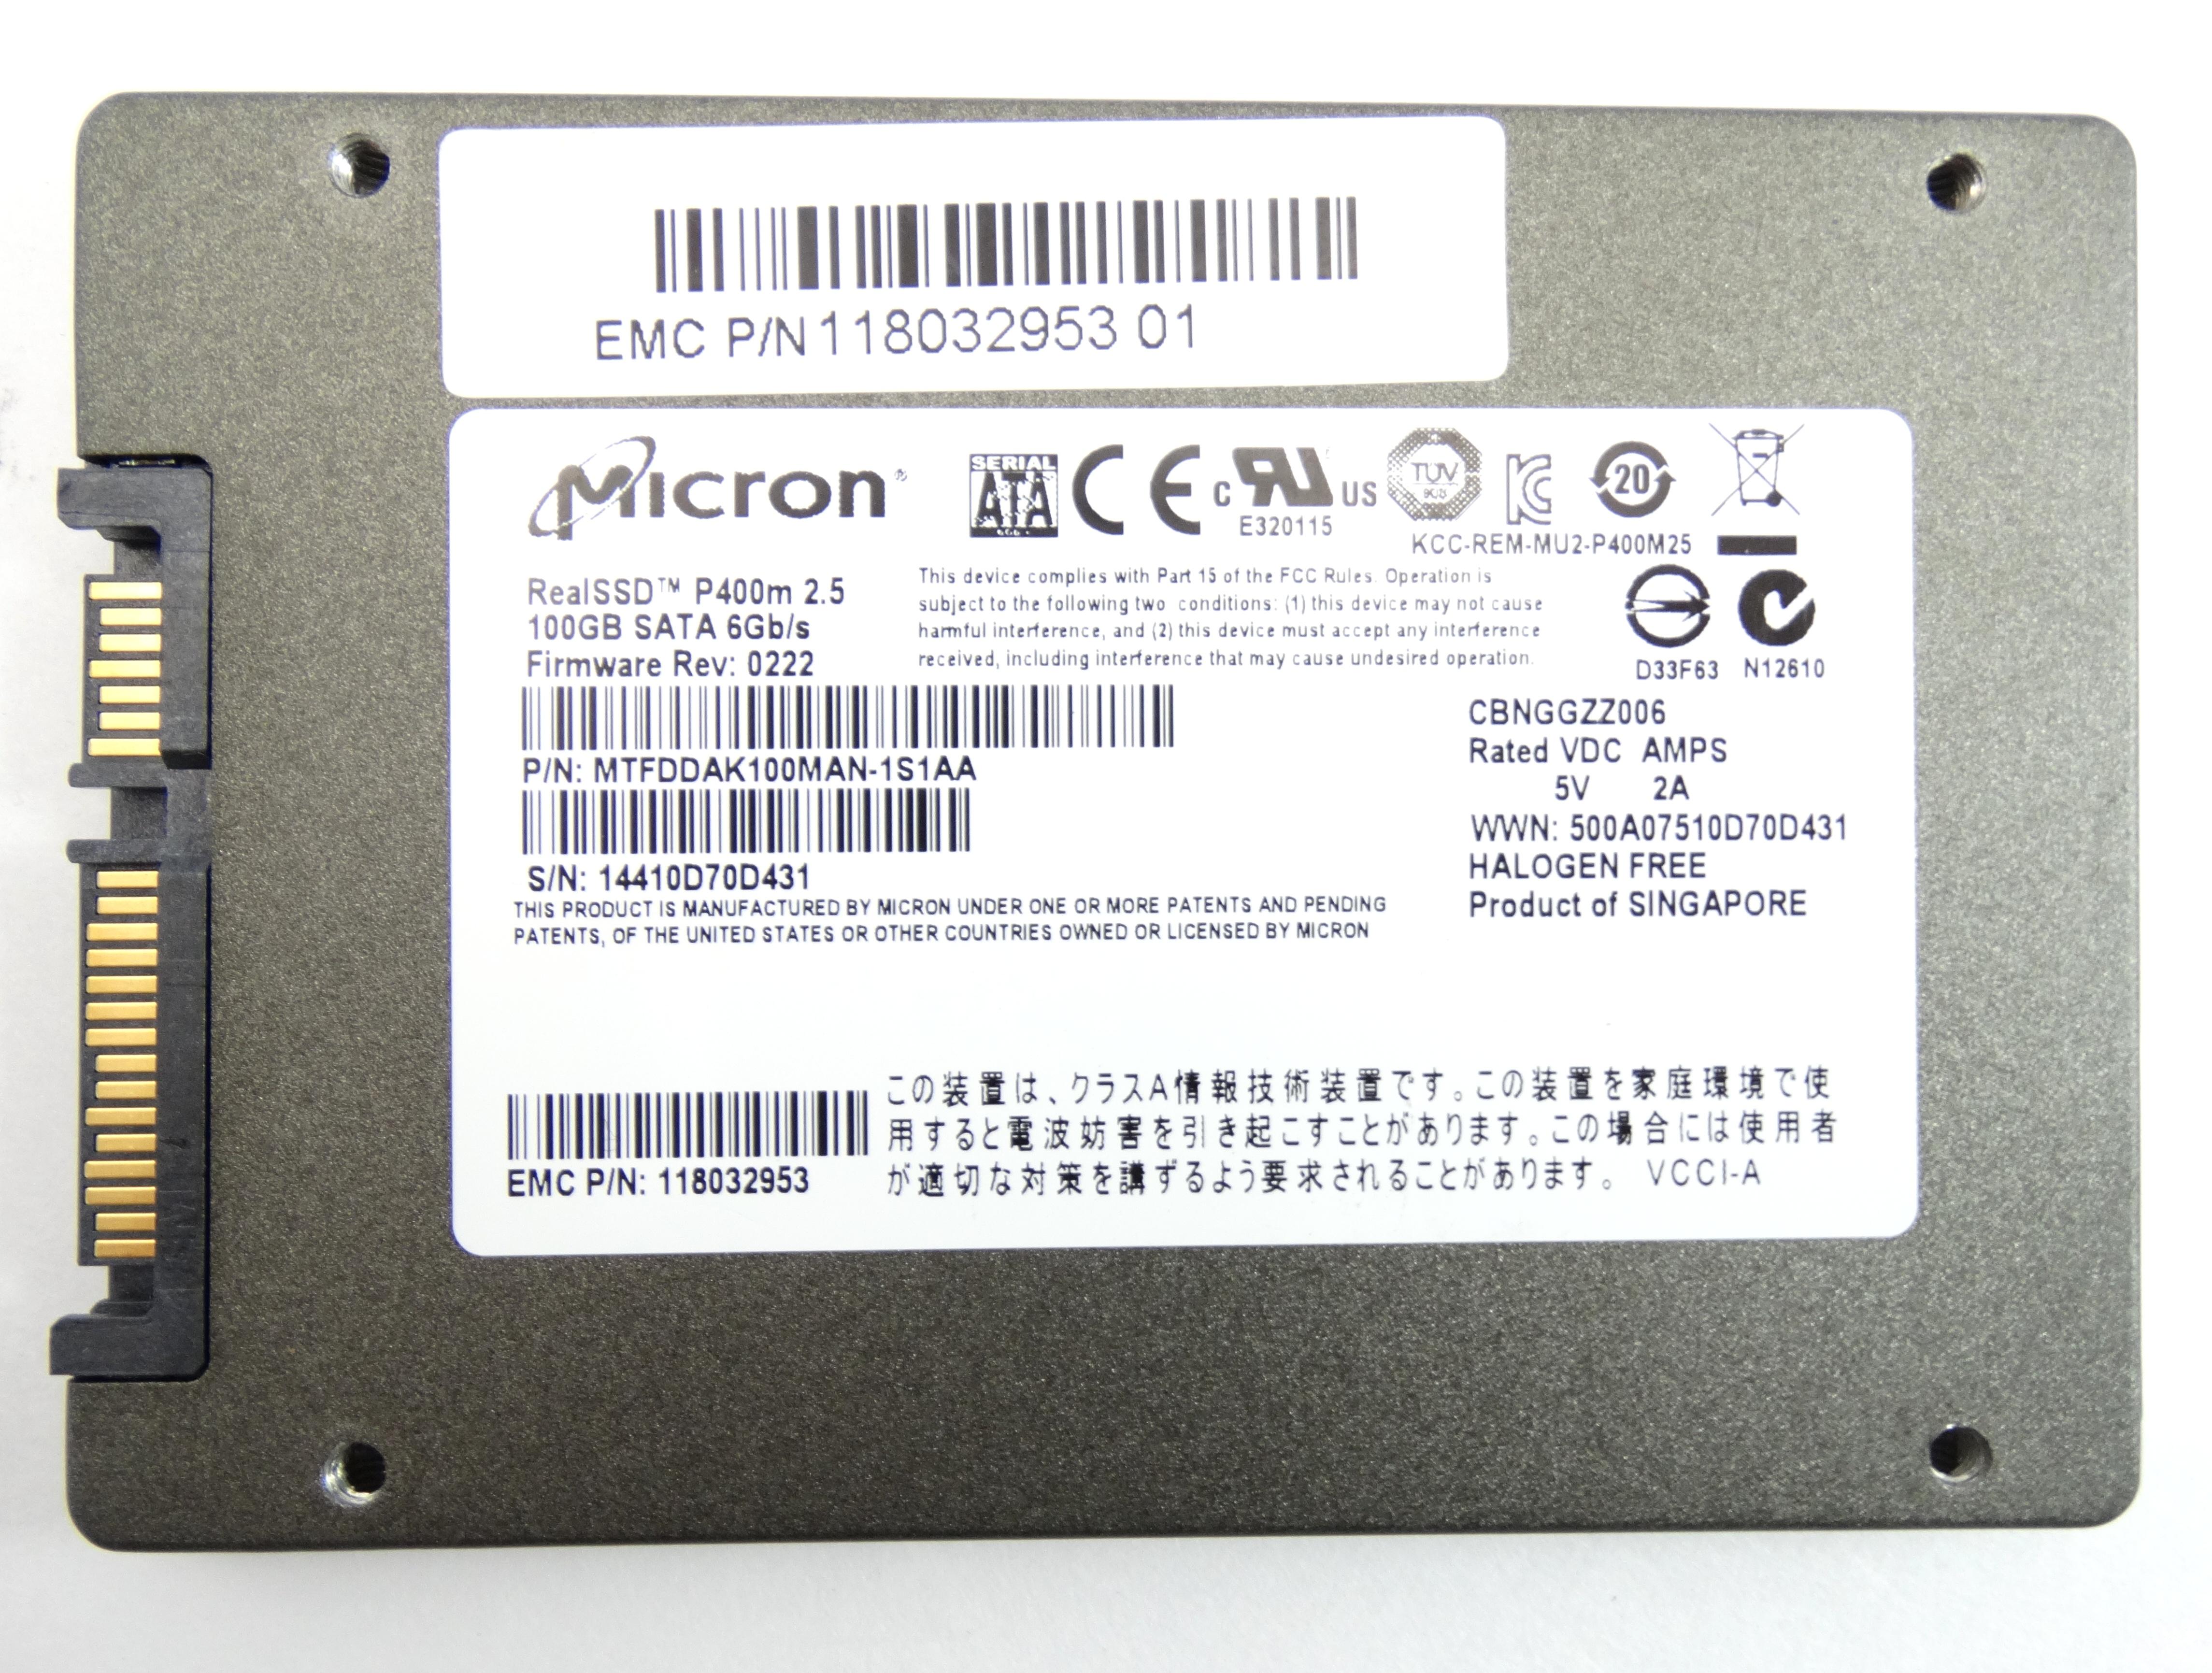 MICRON REAL SSD P400M 100GB 6GBPS SATA 2.5'' SOLID STATE DRIVE (MTFDDAK100MAN)